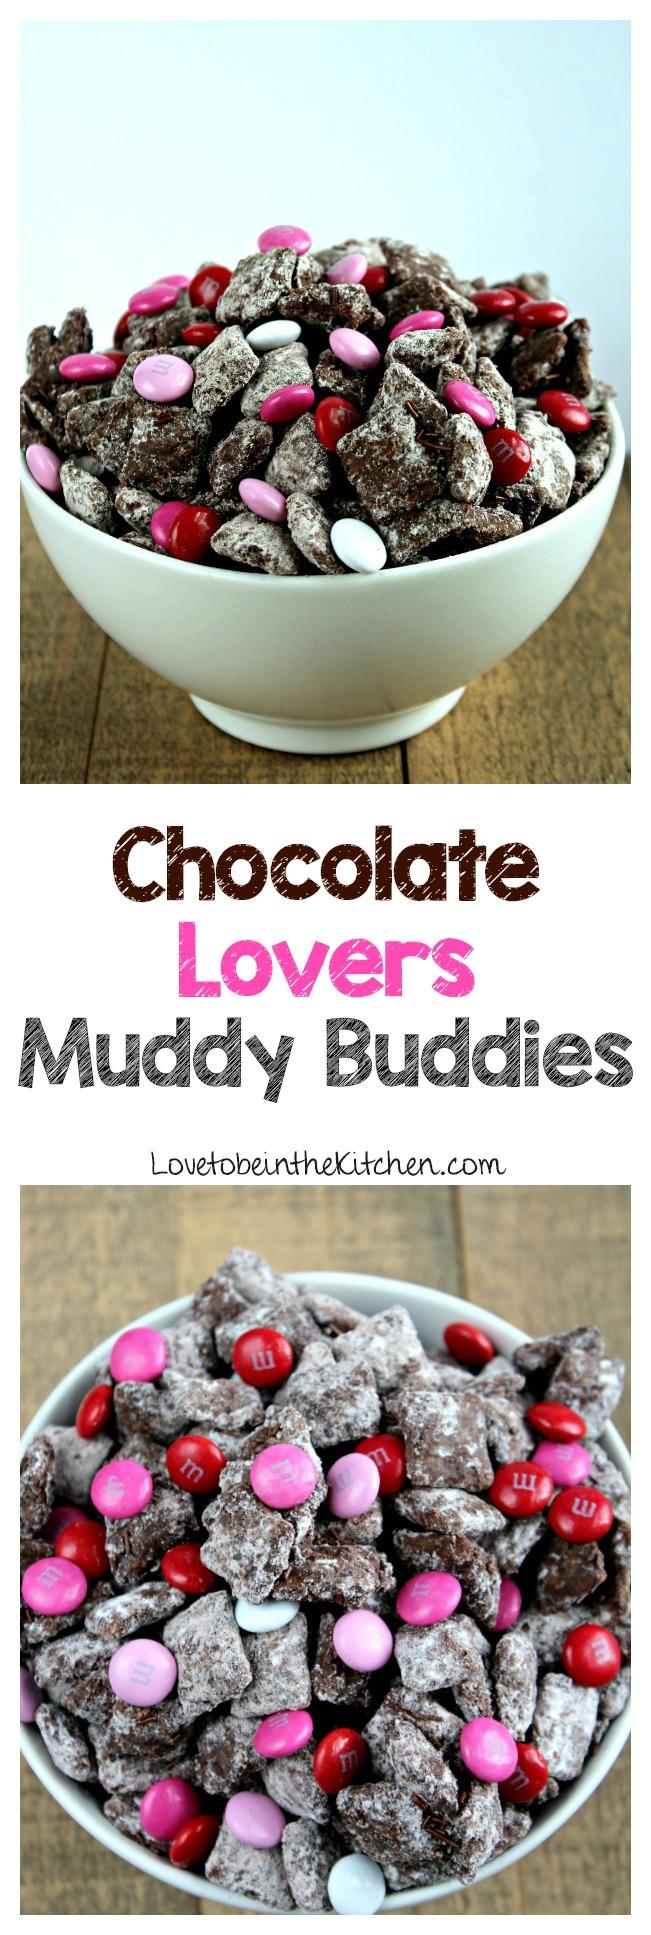 Chocolate Lovers Muddy Buddies